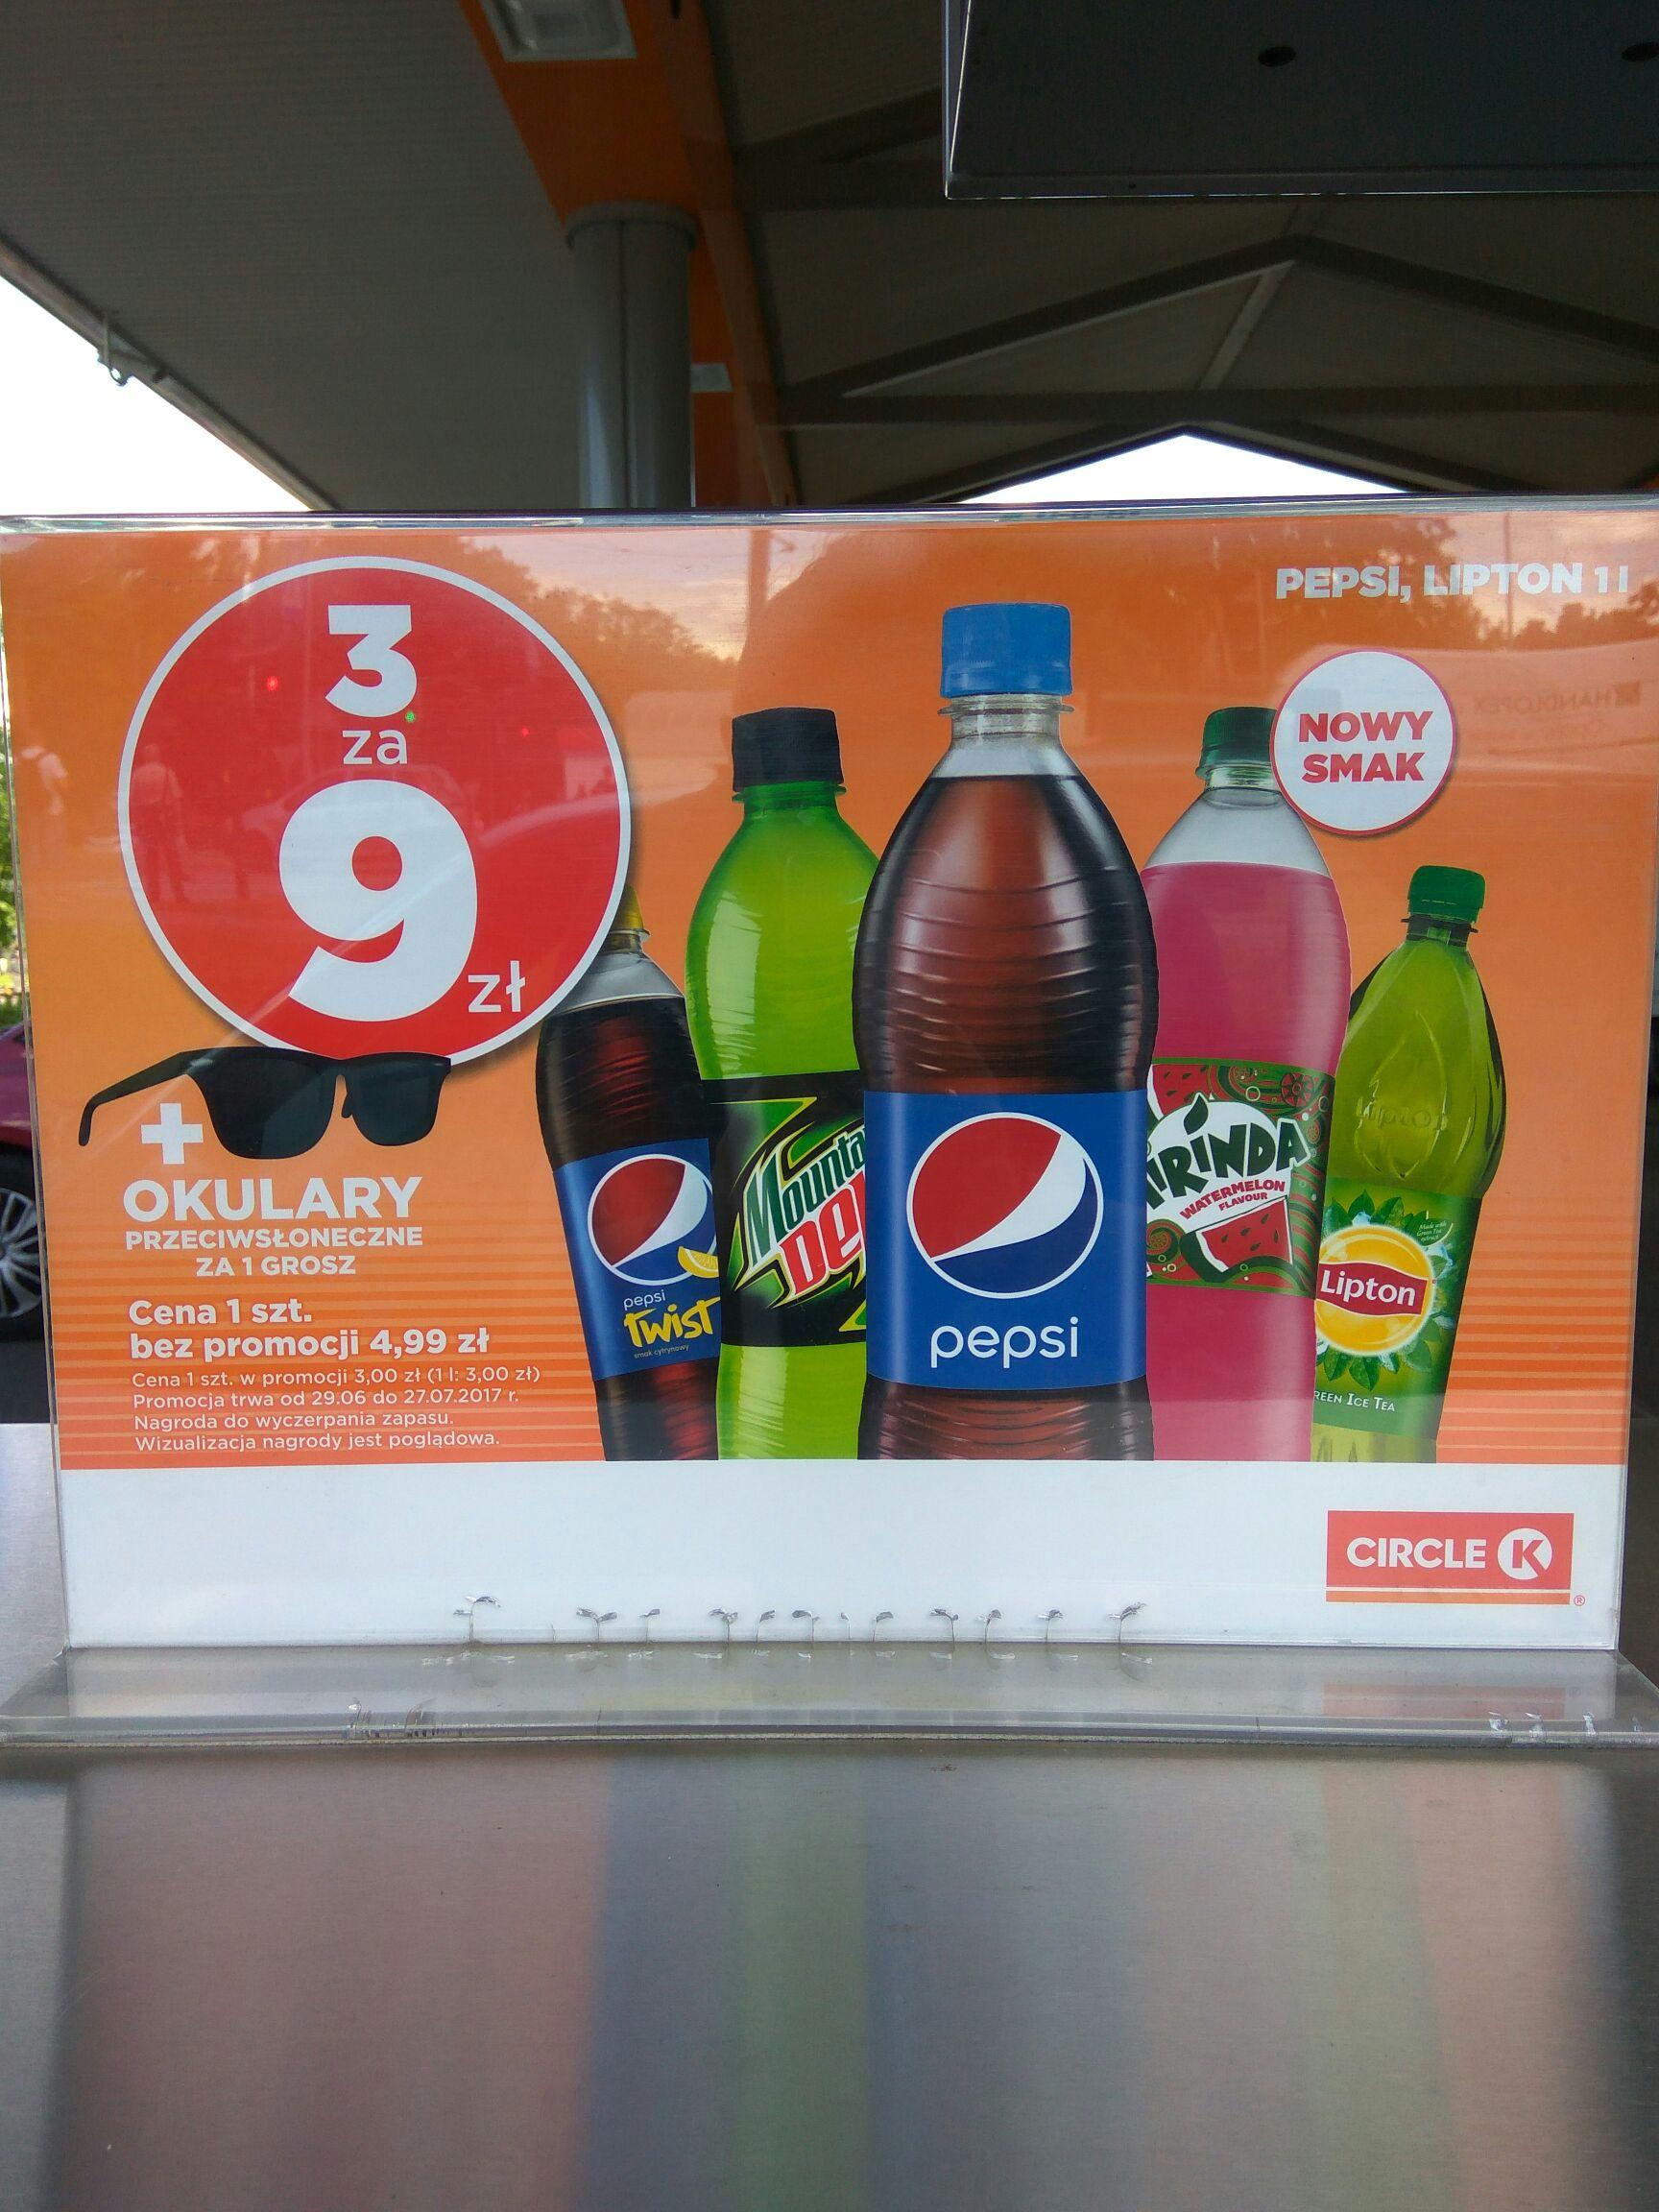 Pepsi 3x1L za 9zl plus okulary za 1gr na STATOIL (CIRCLE K)